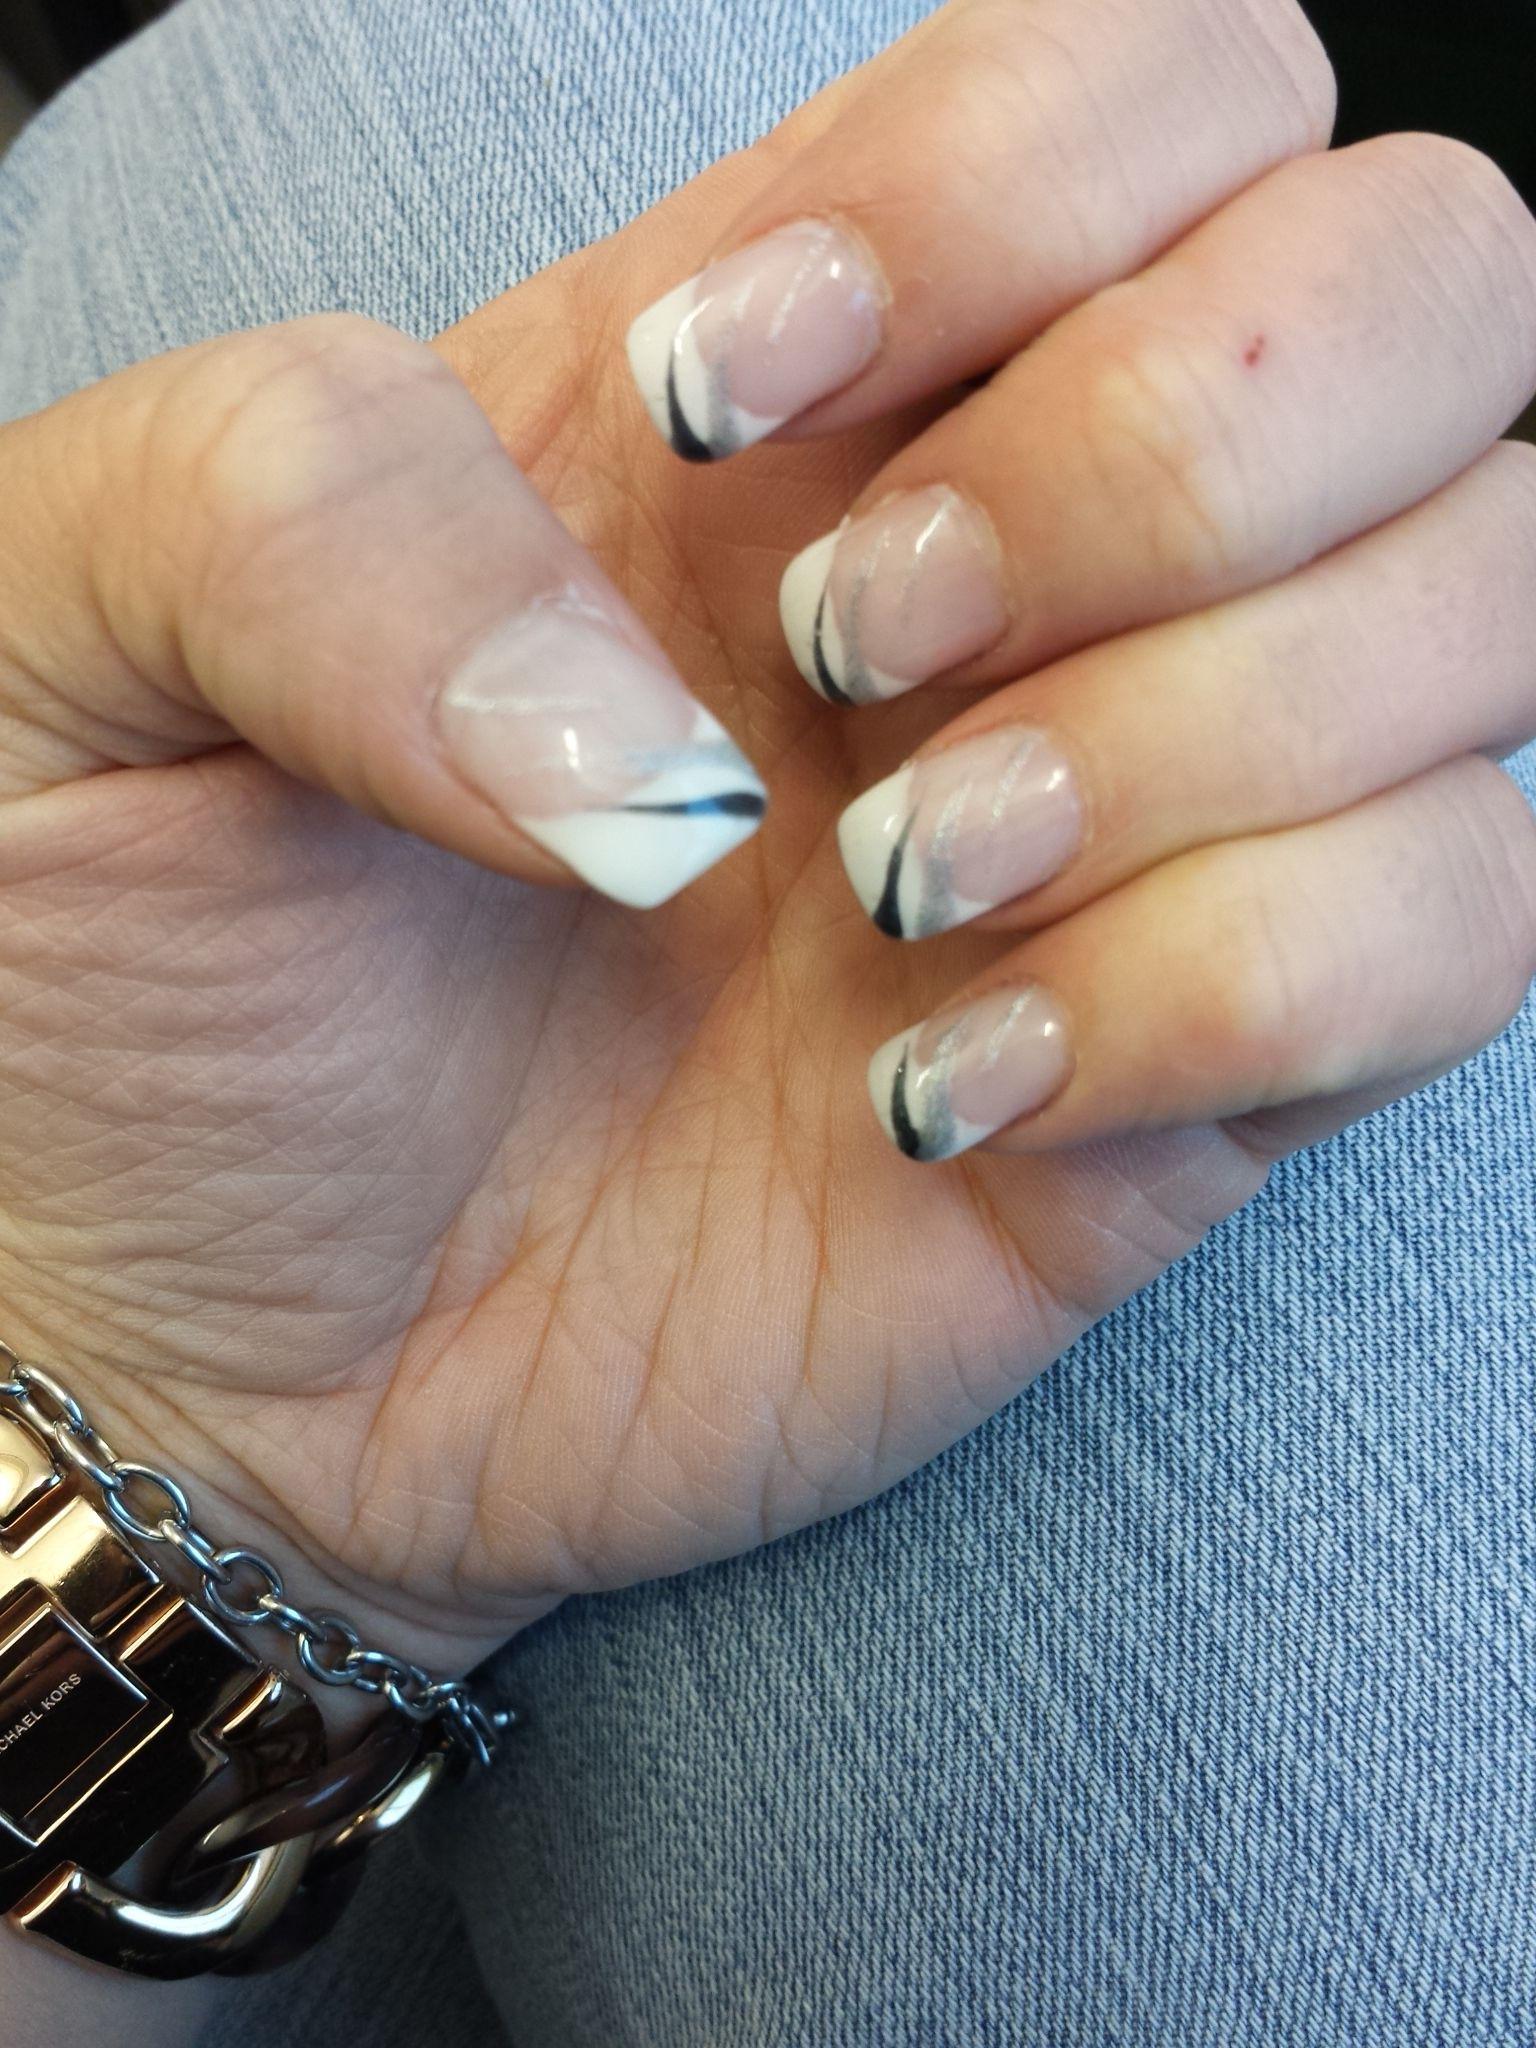 Nail, nails, French nail, design, idea manicure, White & silver & black & glitter